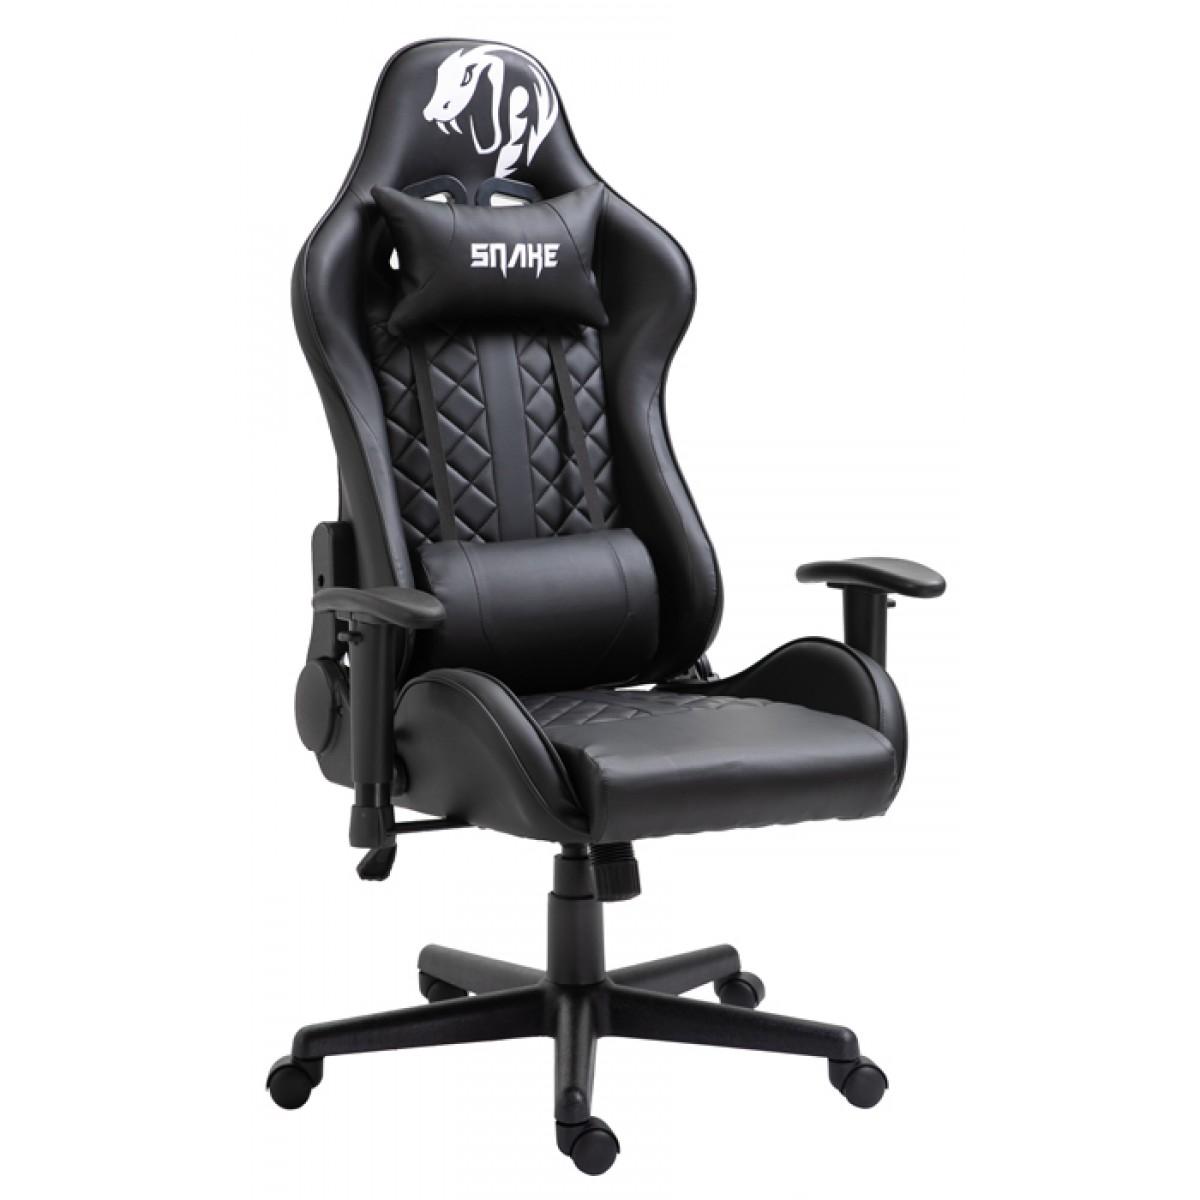 Cadeira Gamer Snake Mamba Negra 9183, Reclinável, Black